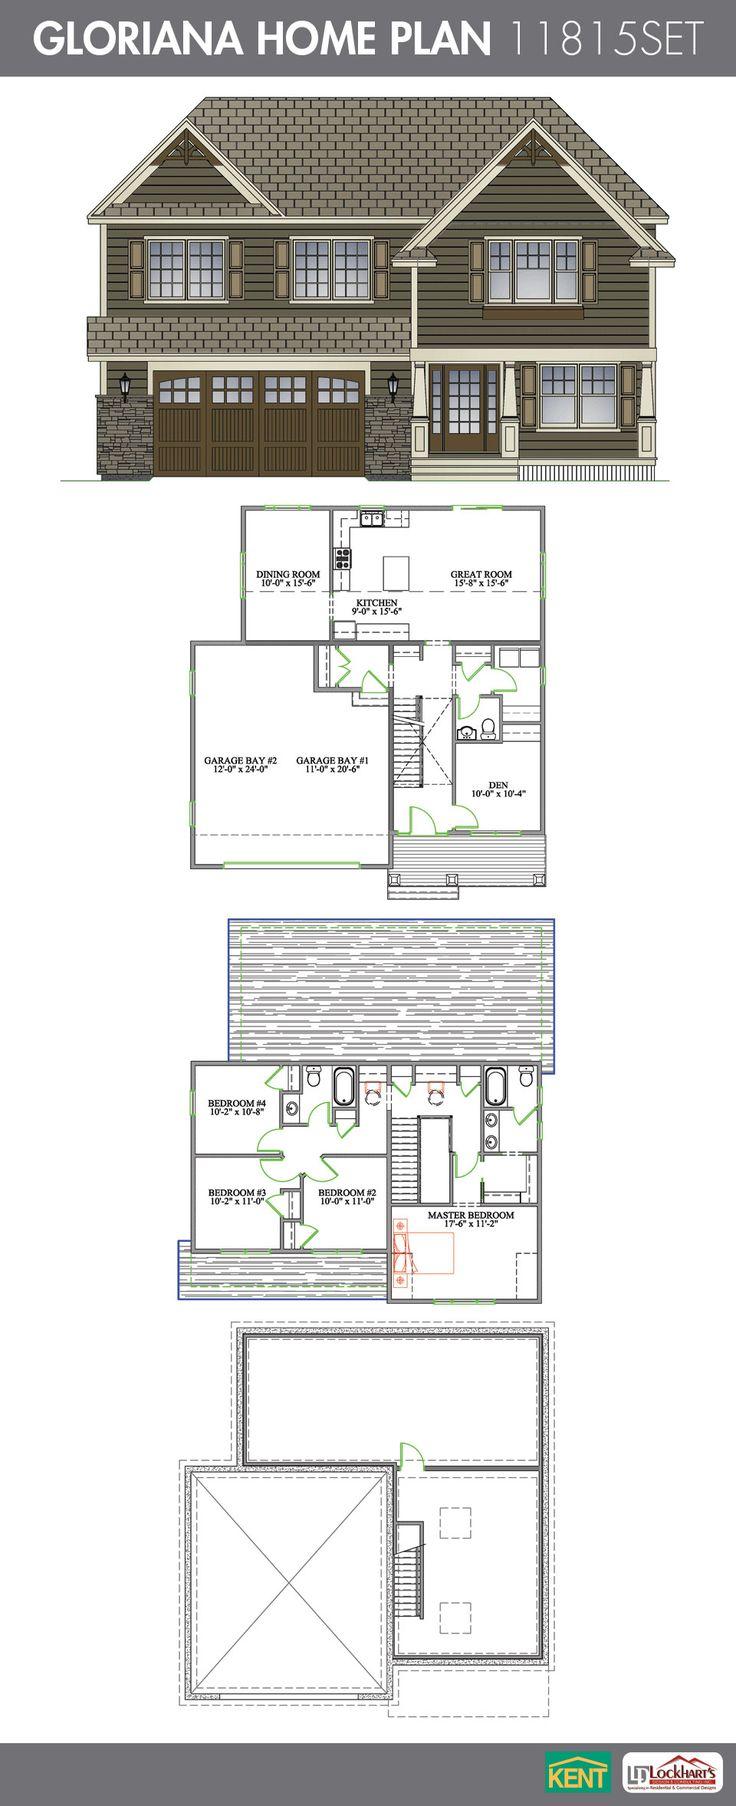 Gloriana 4 bedroom 2 12 bath home plan